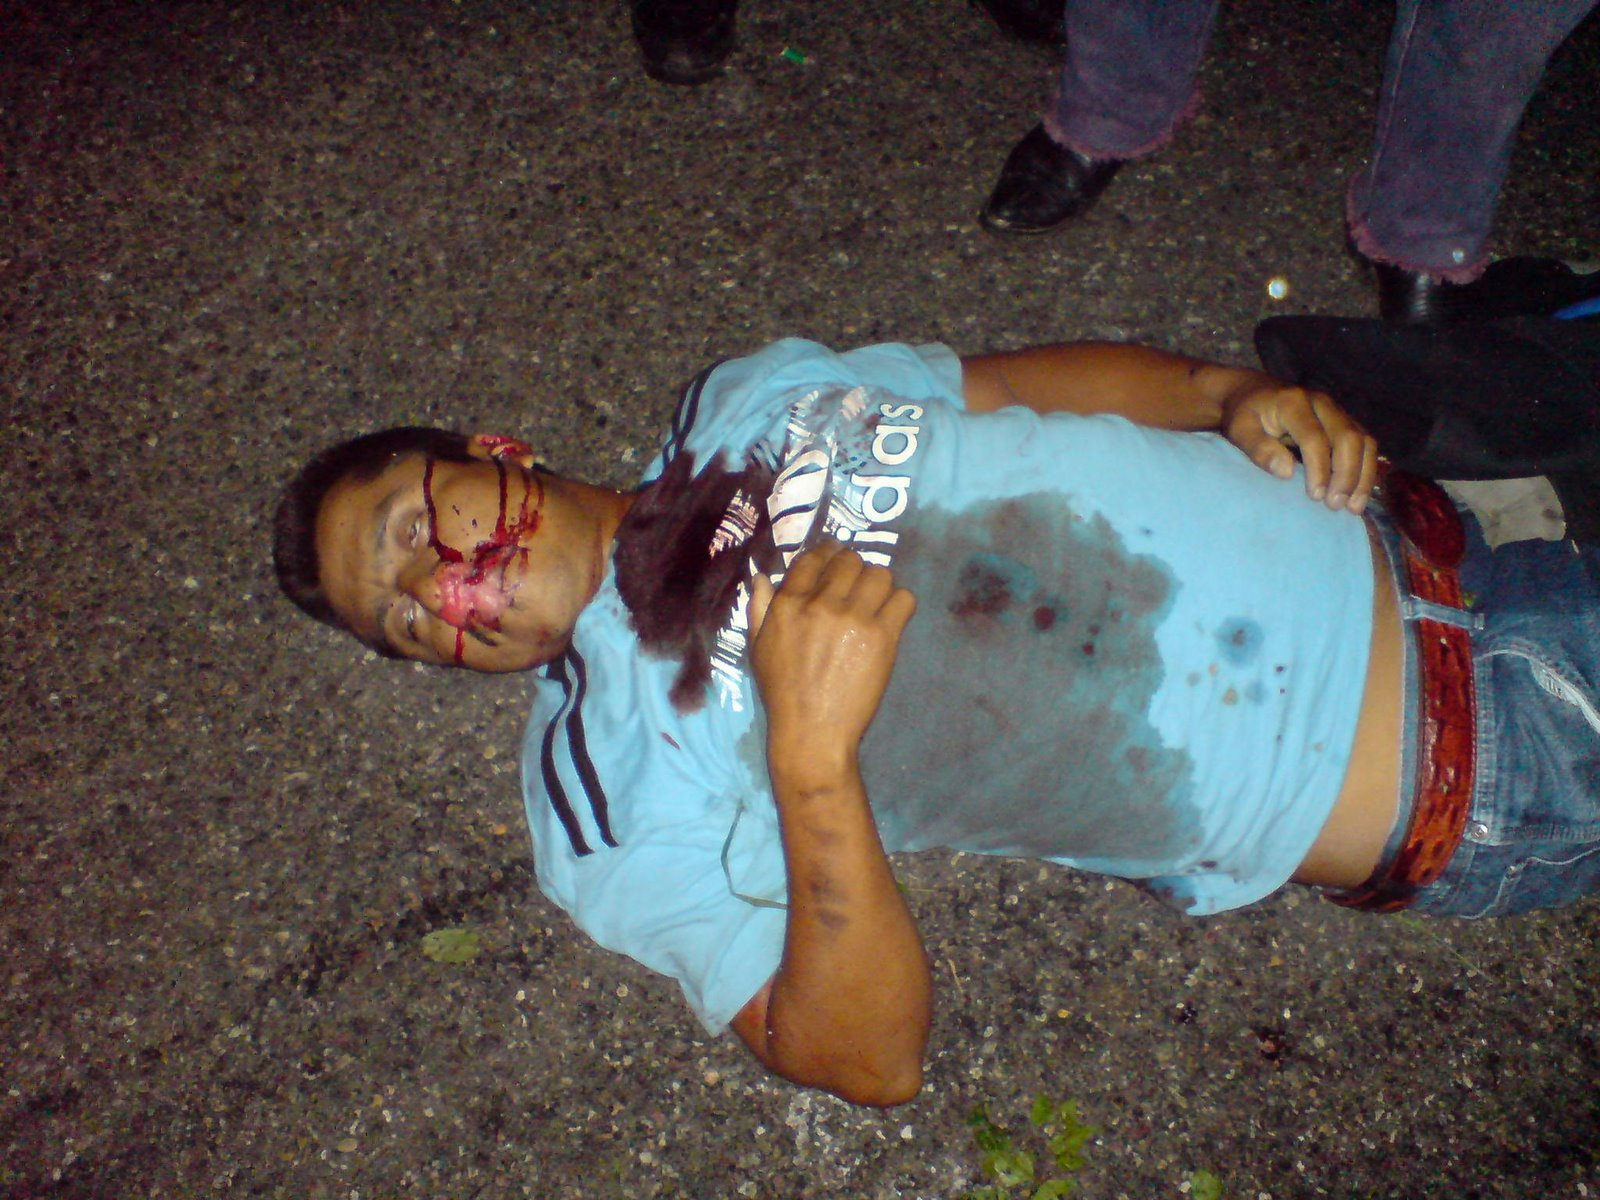 Mexican Mafia Killings